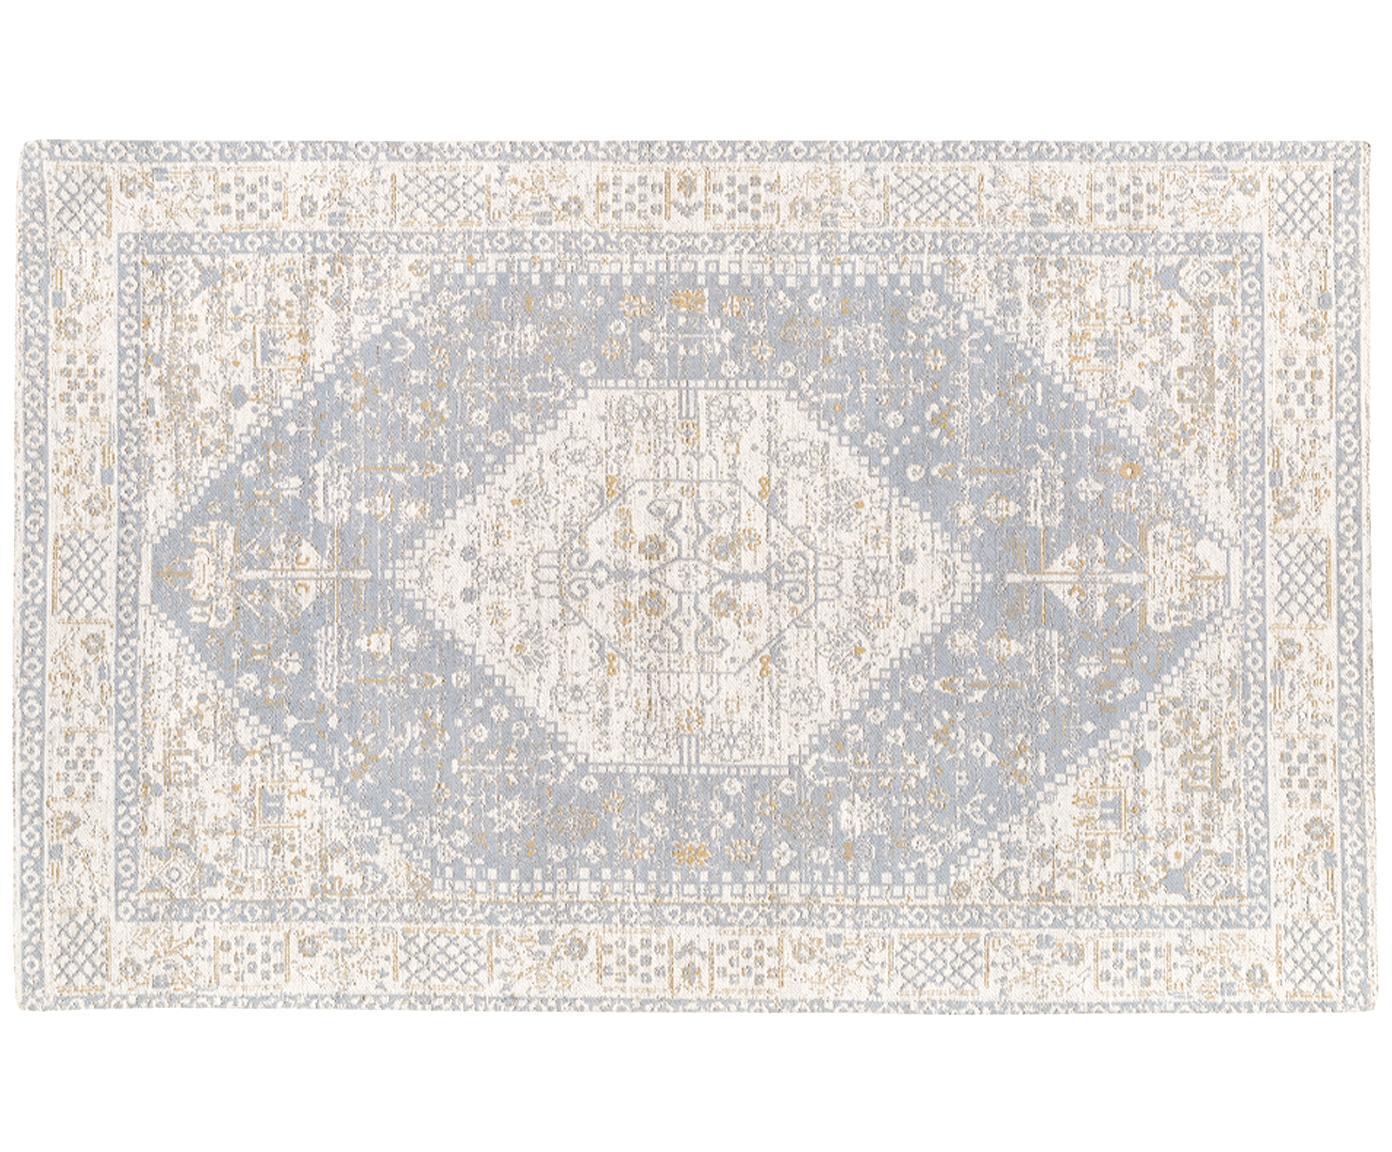 Alfombra artesanal de chenilla Neapel, estilo vintage, Parte superior: 95%algodón, 5%poliéster, Reverso: 100%algodón, Gris claro, crema, gris pardo, An 120 x L 180 cm (Tamaño S)